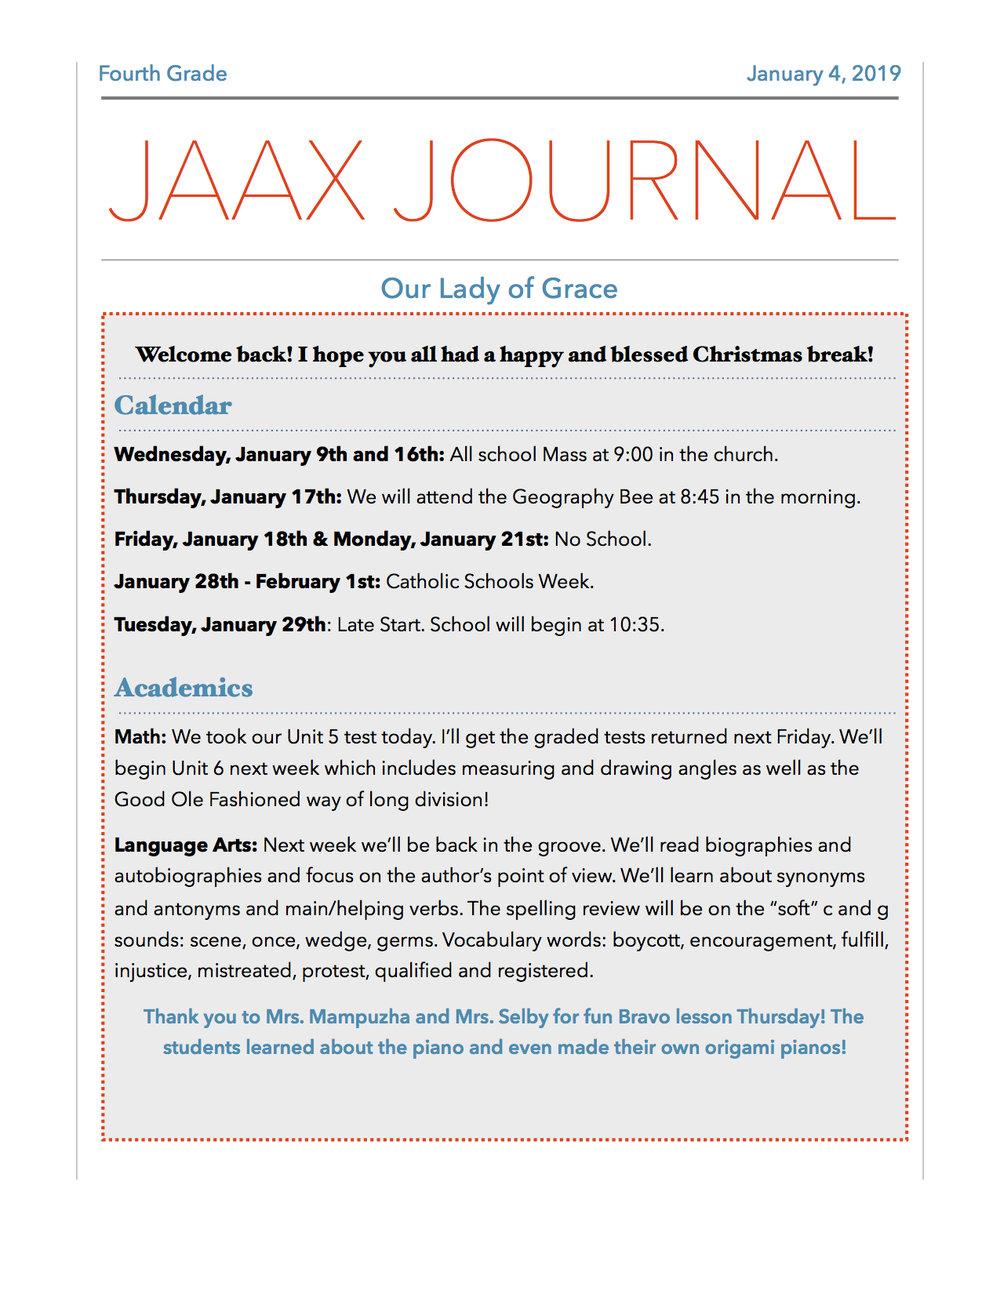 JaaxJournal1-4-19.jpg